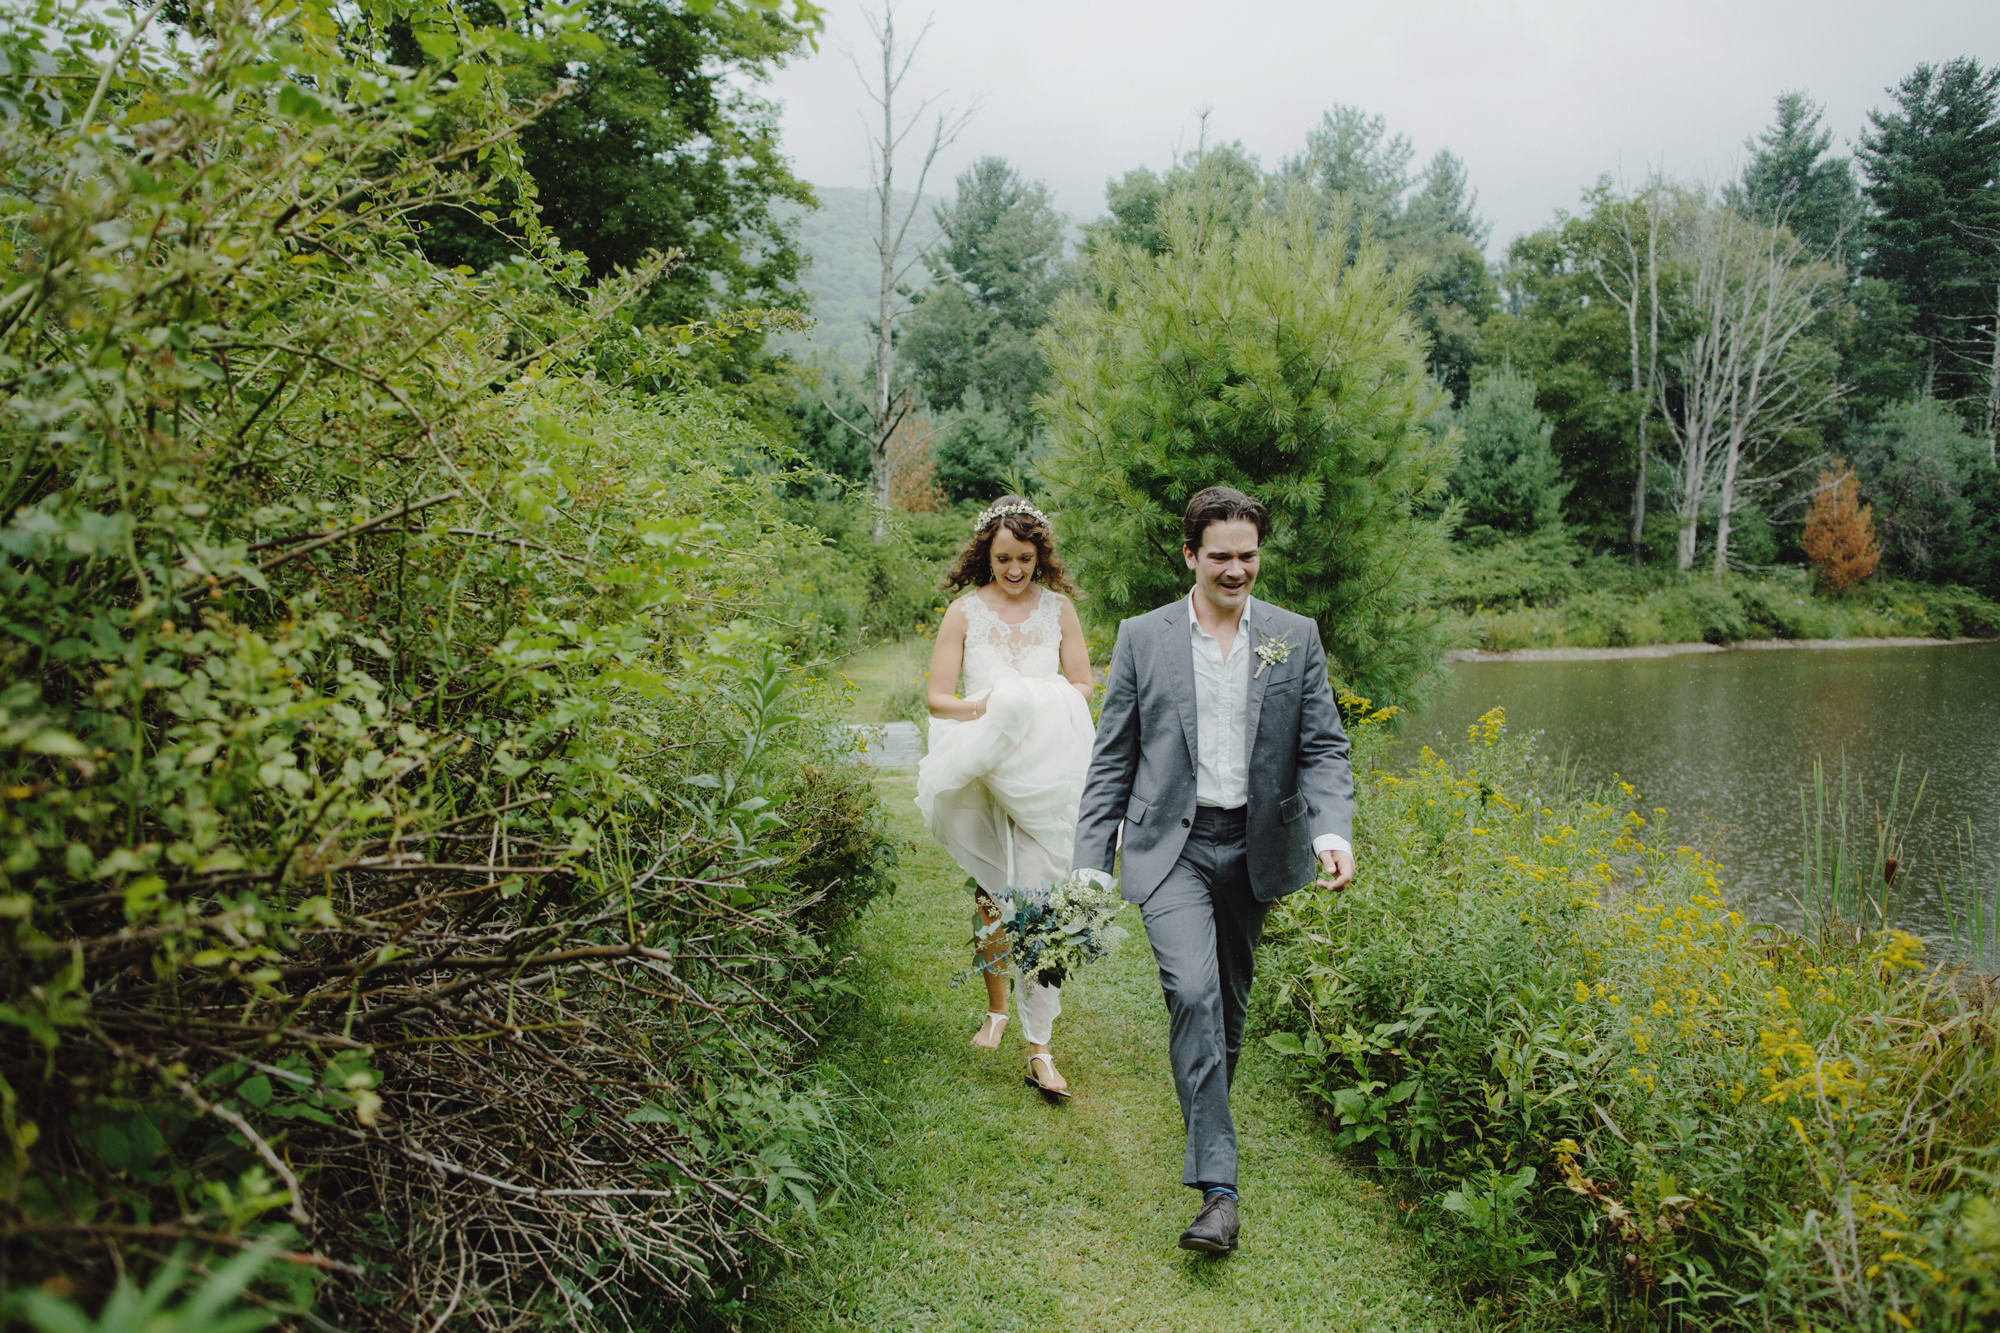 catskills_big_indian_springs_upstate_NY_wedding_sammblake087.jpg